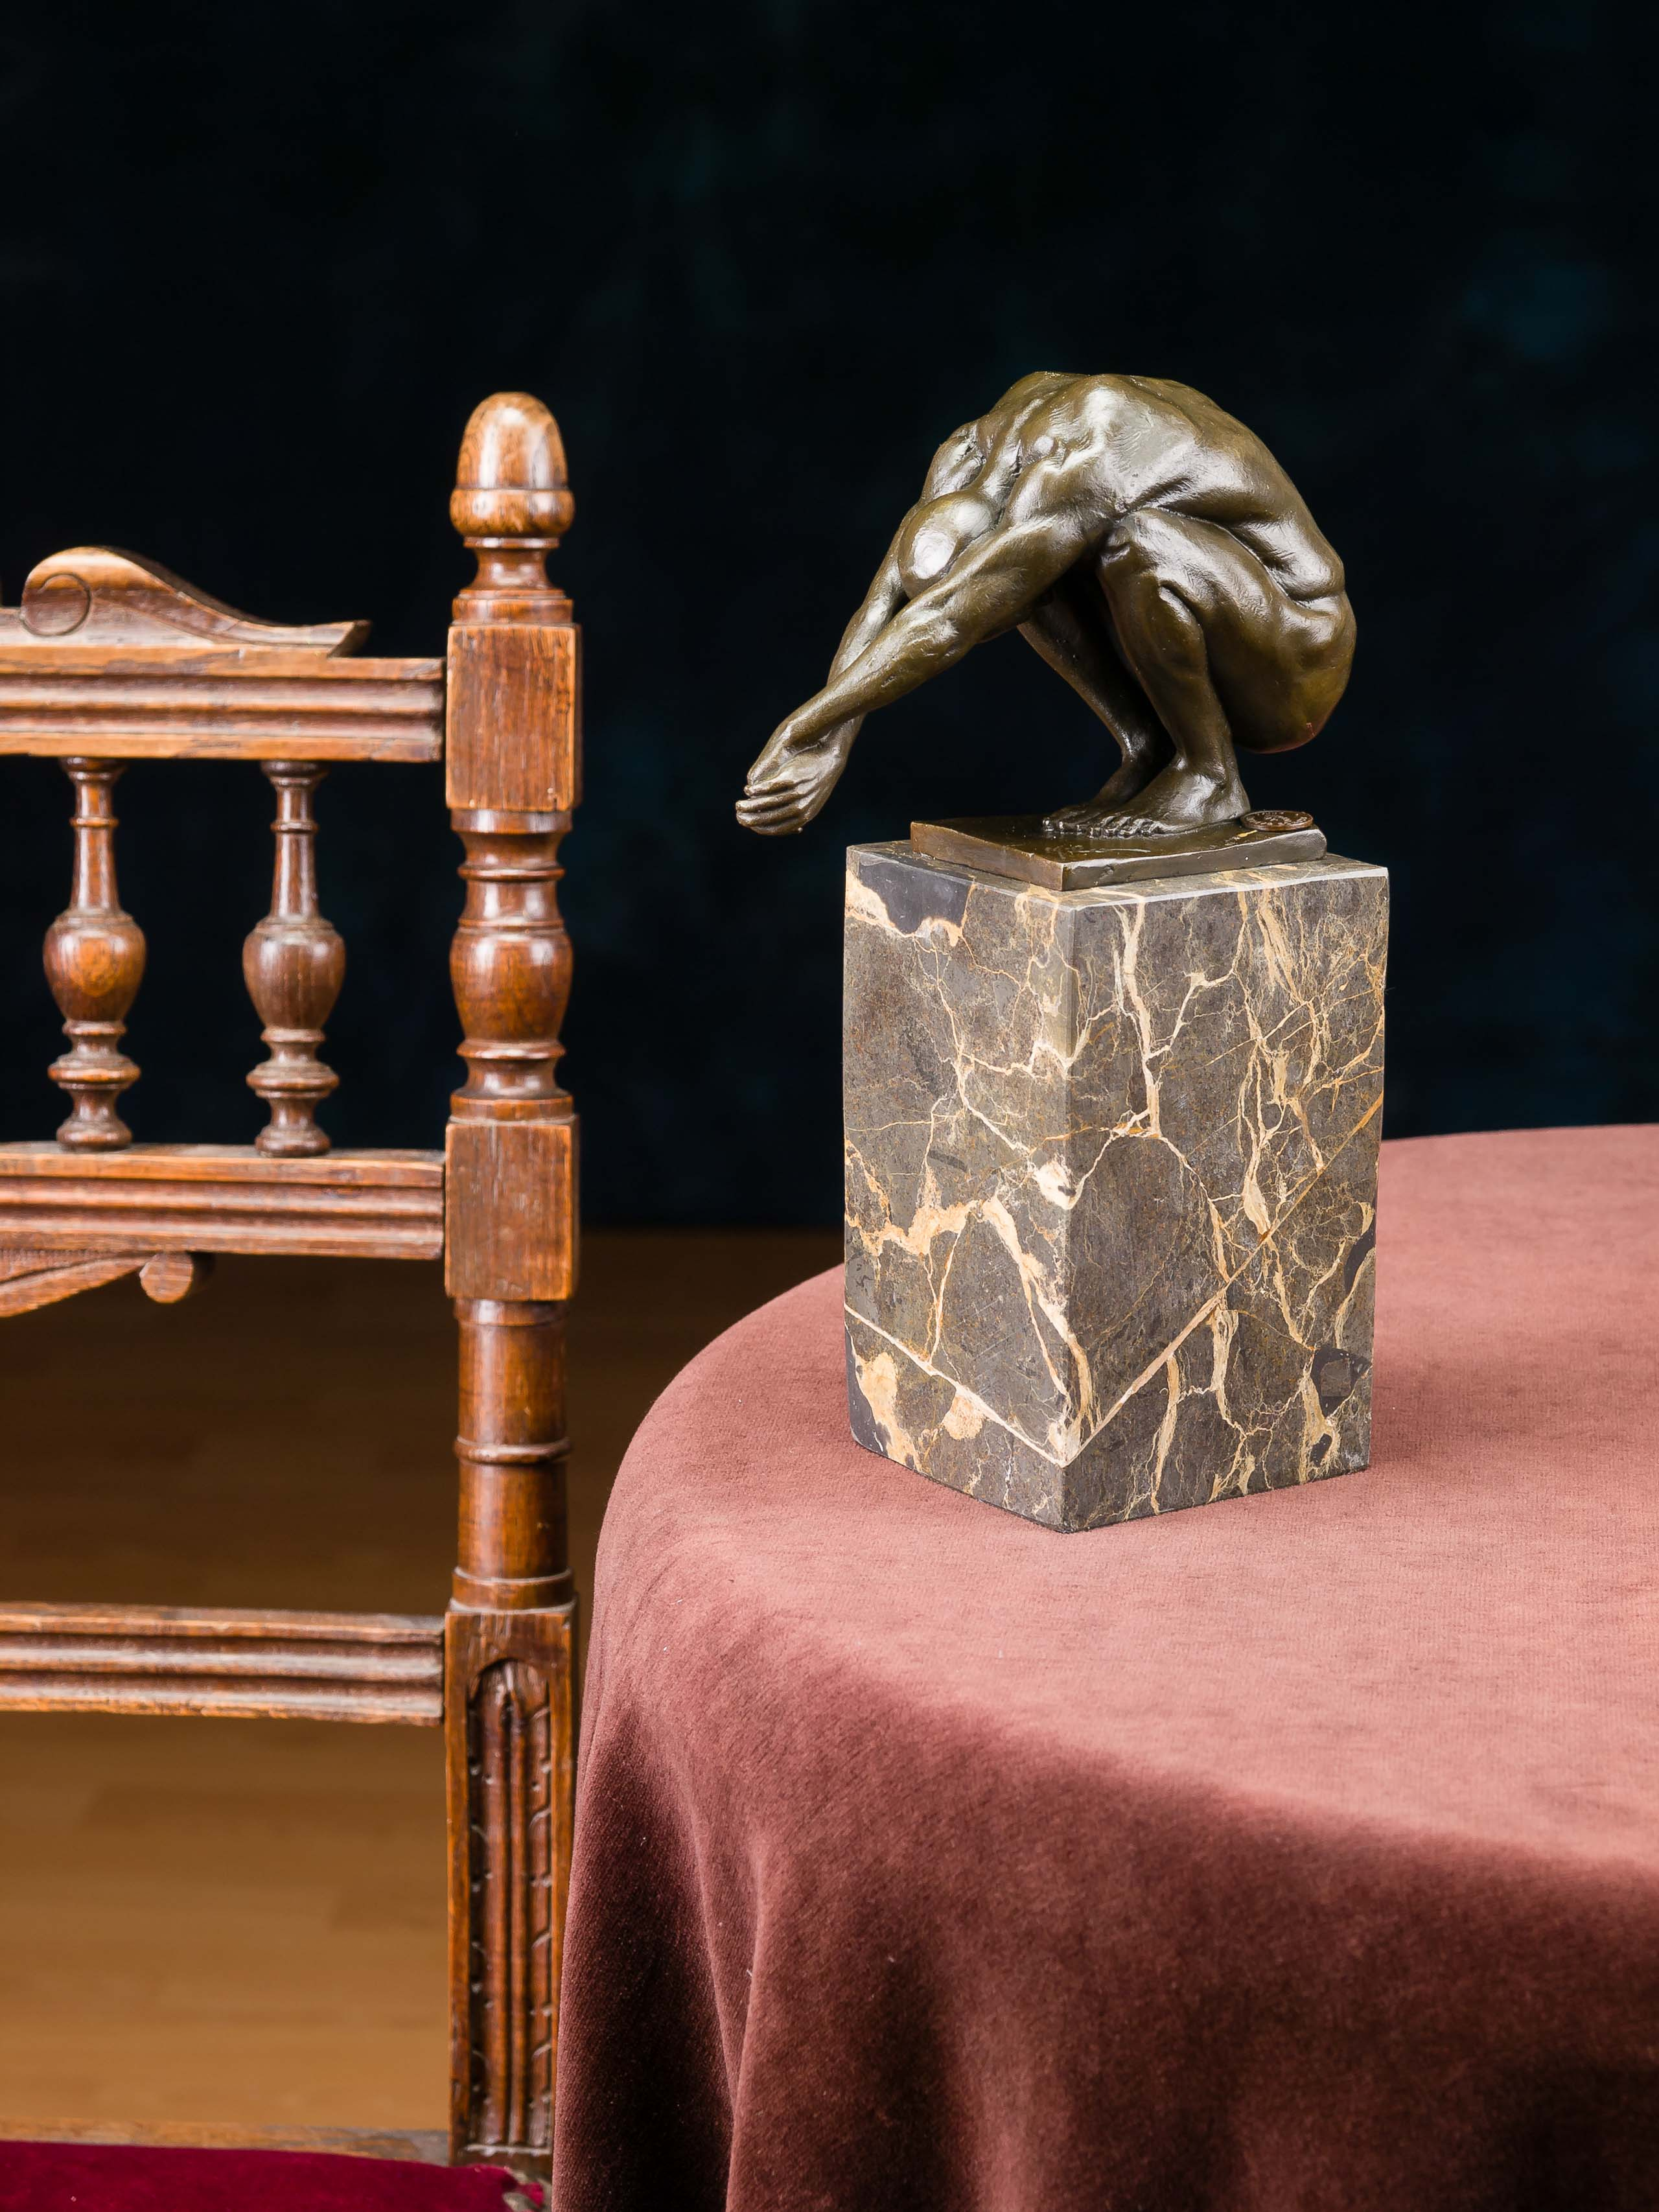 Natural Rustic Slate Square Coasters Drink Table Mat Handmade 48pcs,10x0cm Bulk